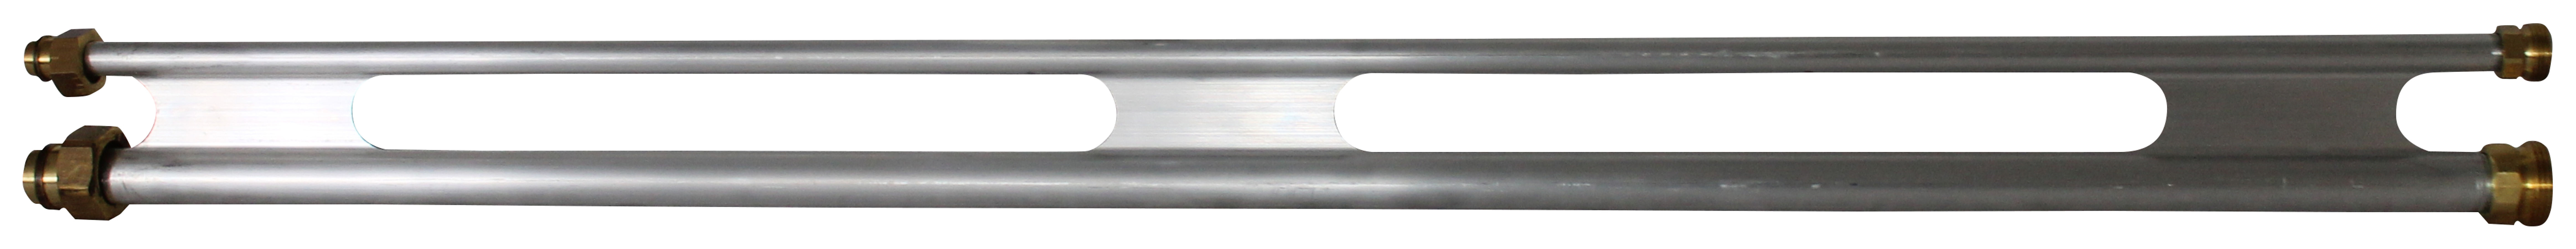 IMG-5120